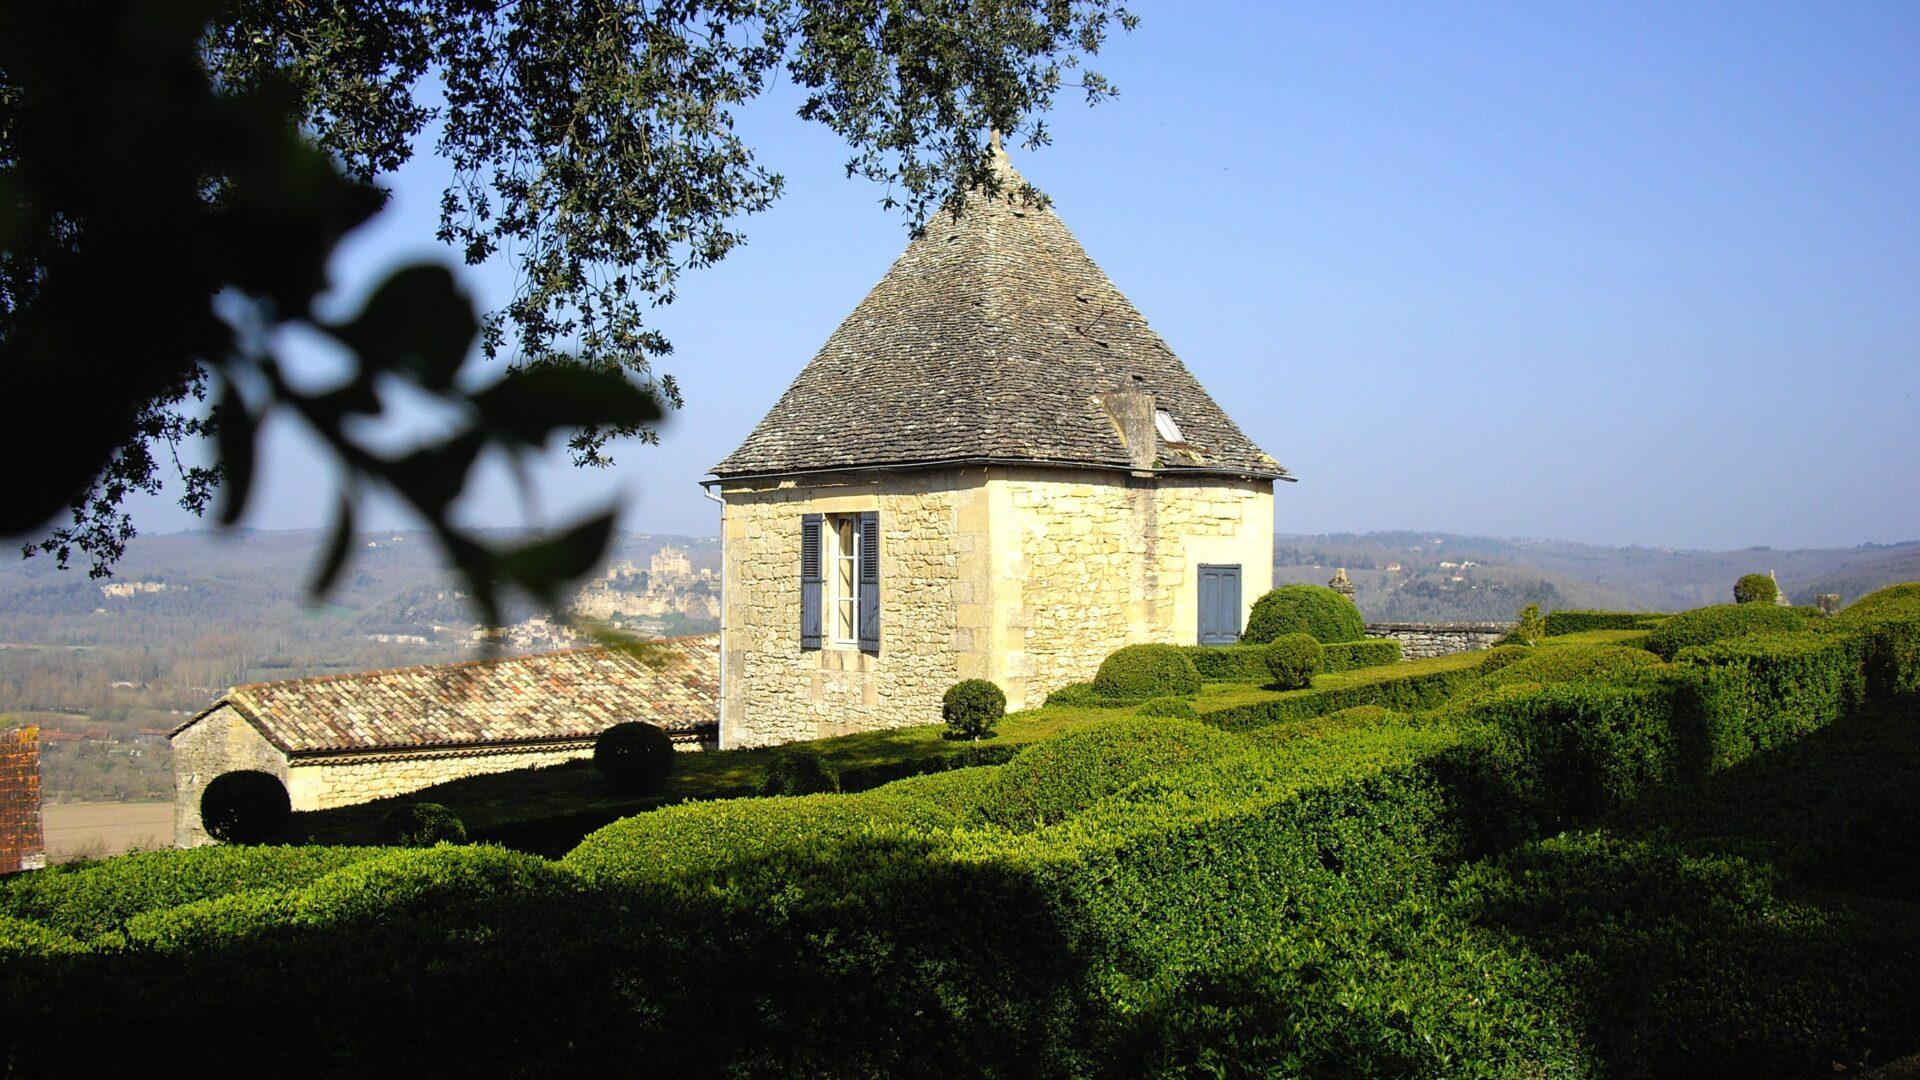 The Marqueyssac gardens in the Dordogne region